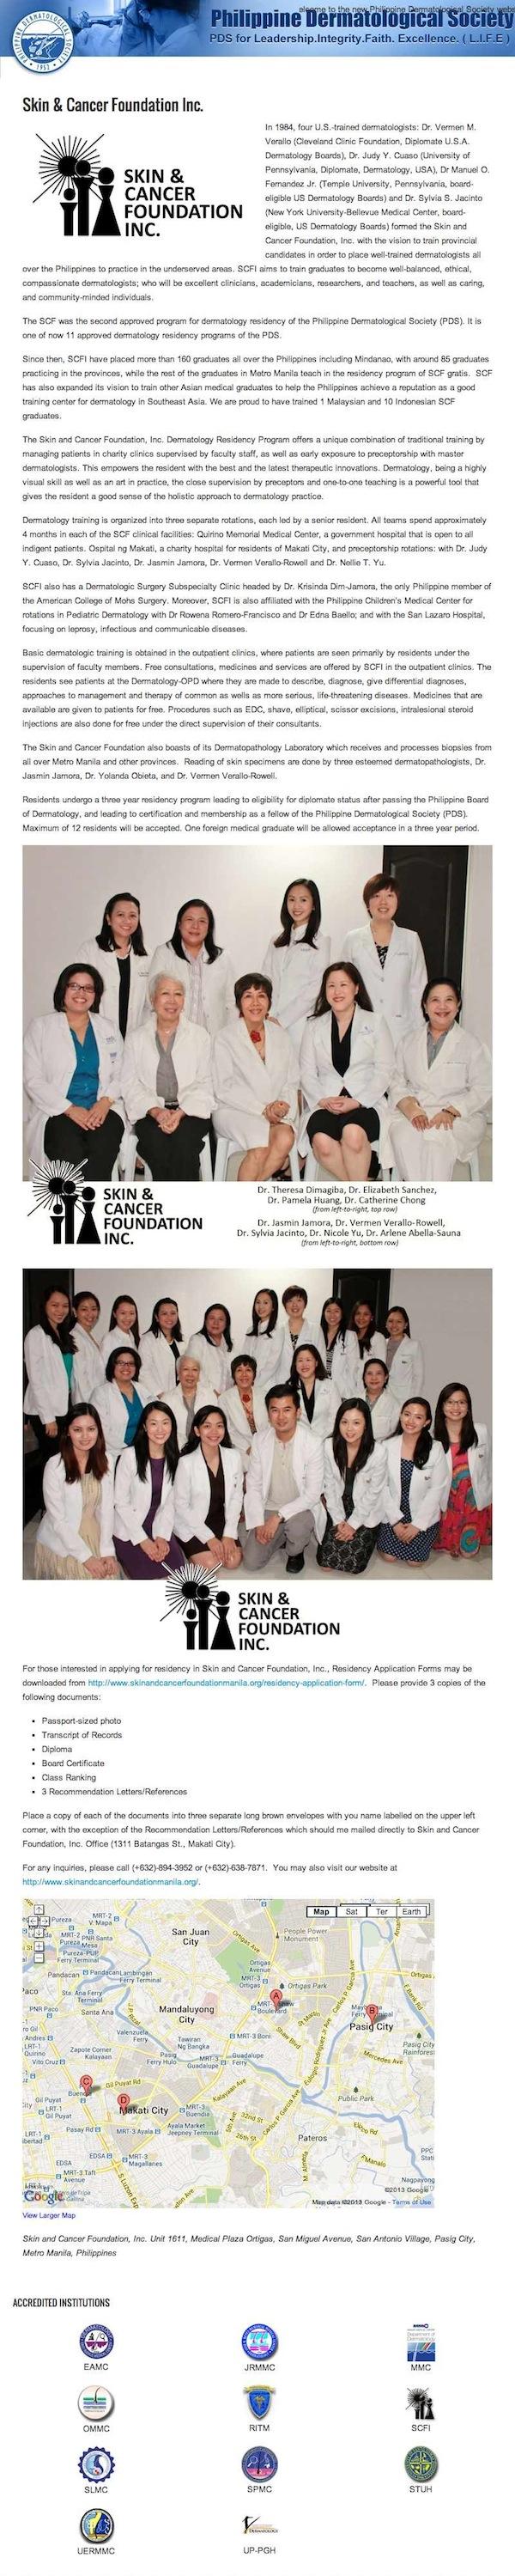 skin-cancer-foundation-dra-verallio-rowell.jpg